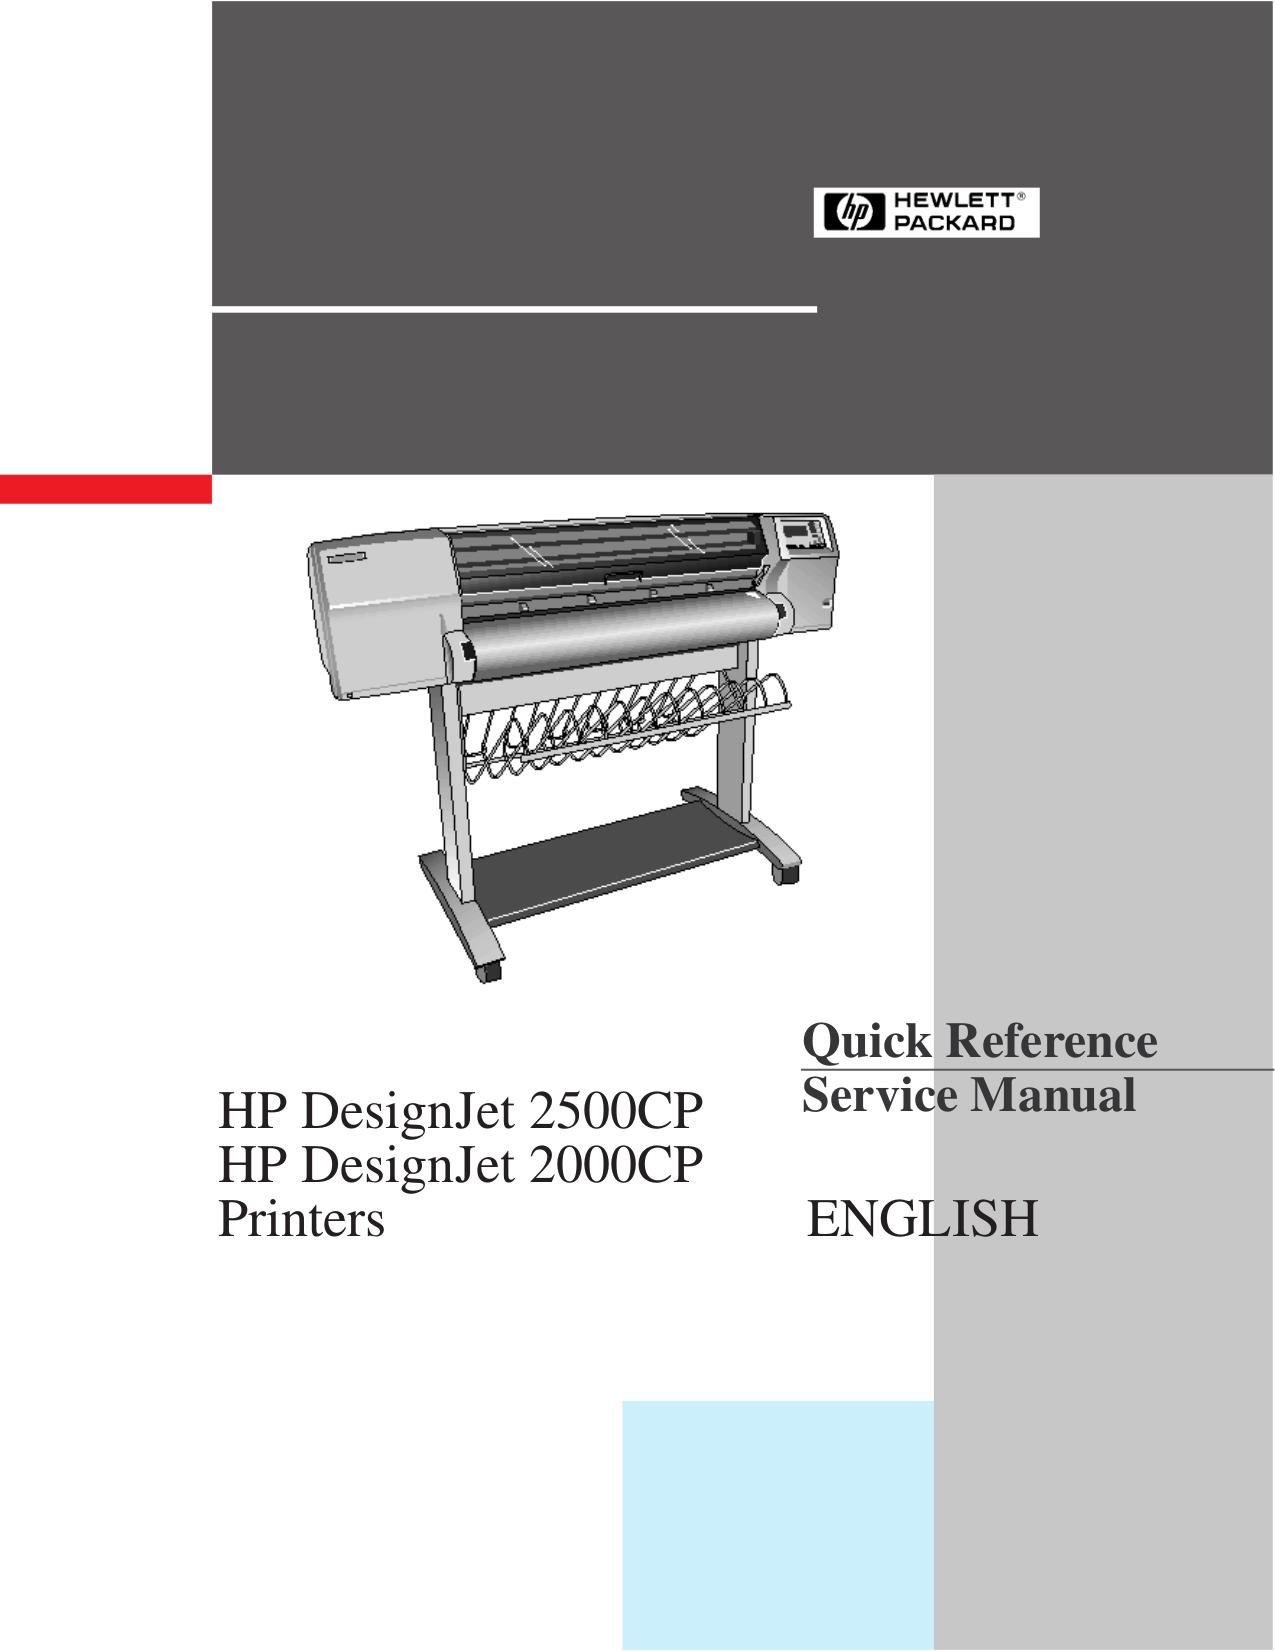 Hp Designjet 2500cp manual